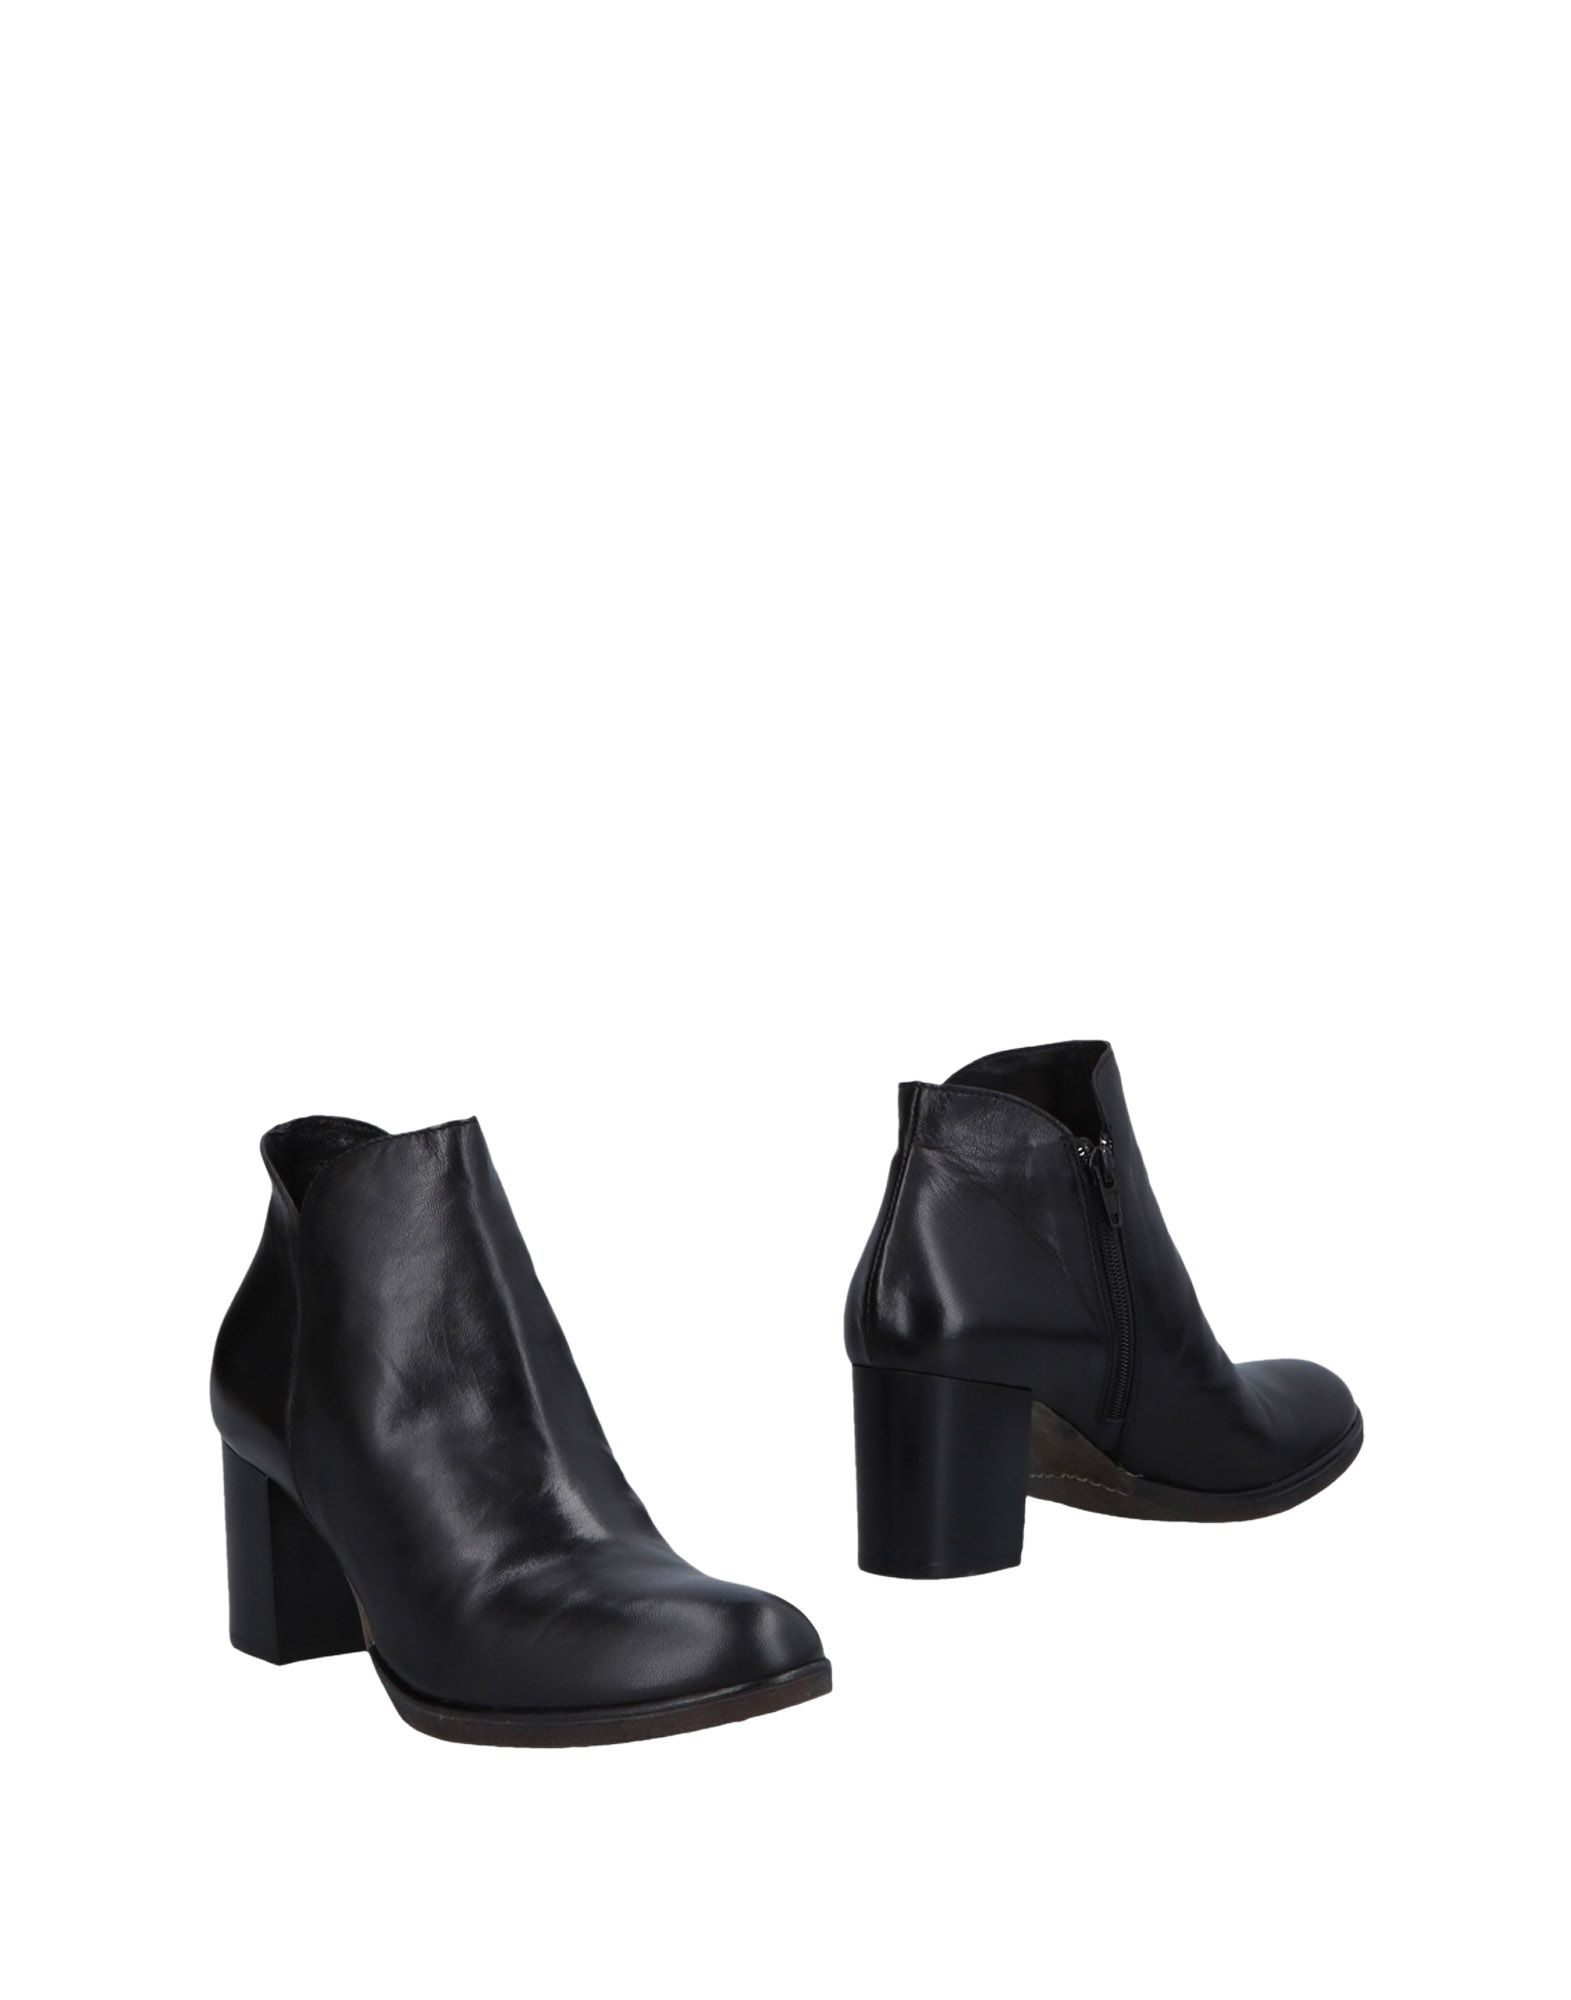 Ubi Major Stiefelette Damen  11467403JM Gute Gute 11467403JM Qualität beliebte Schuhe 19b124